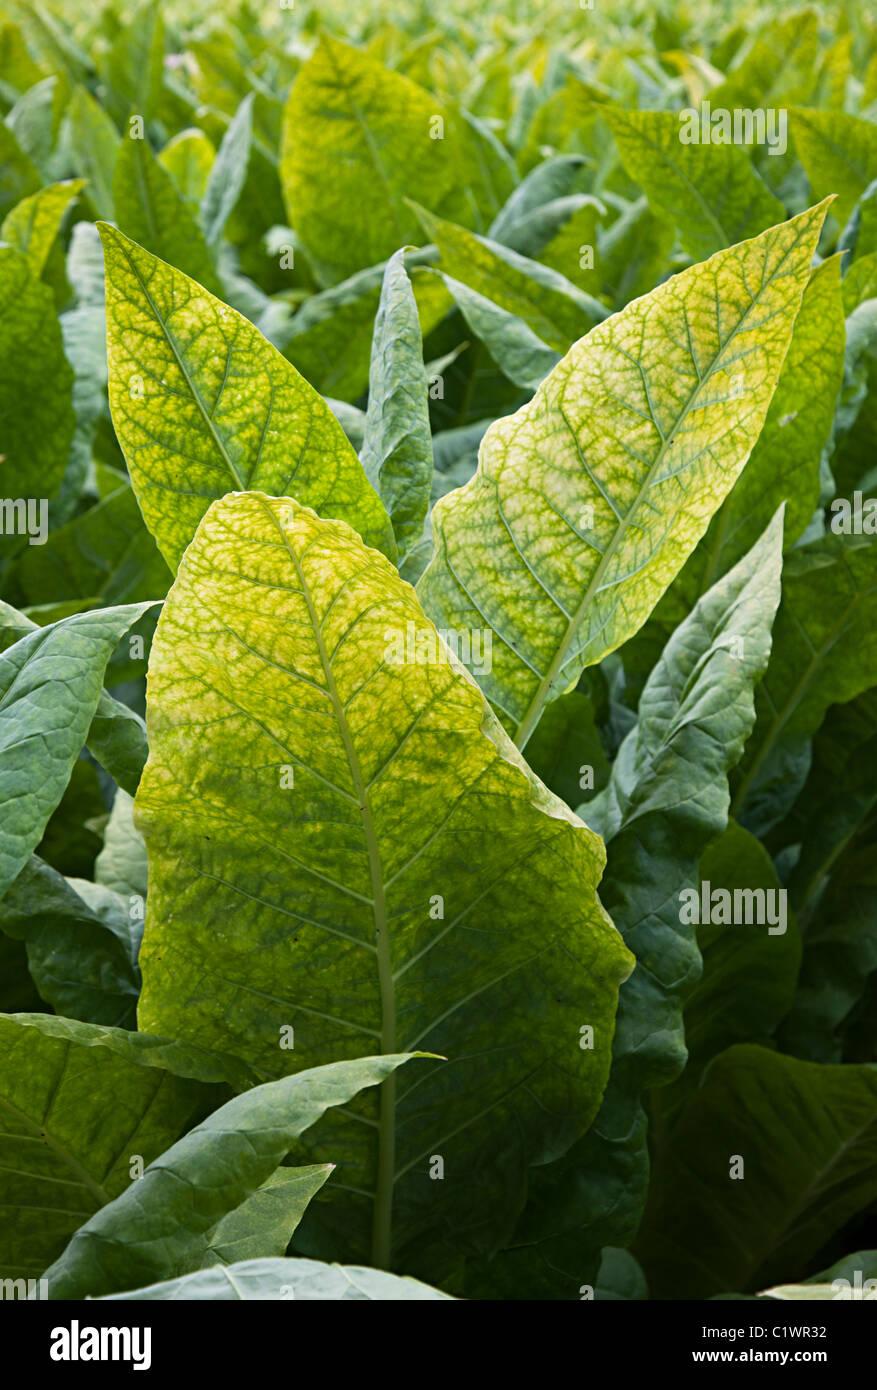 Tobacco crop Beynac-et-Cazenac Dordogne France - Stock Image